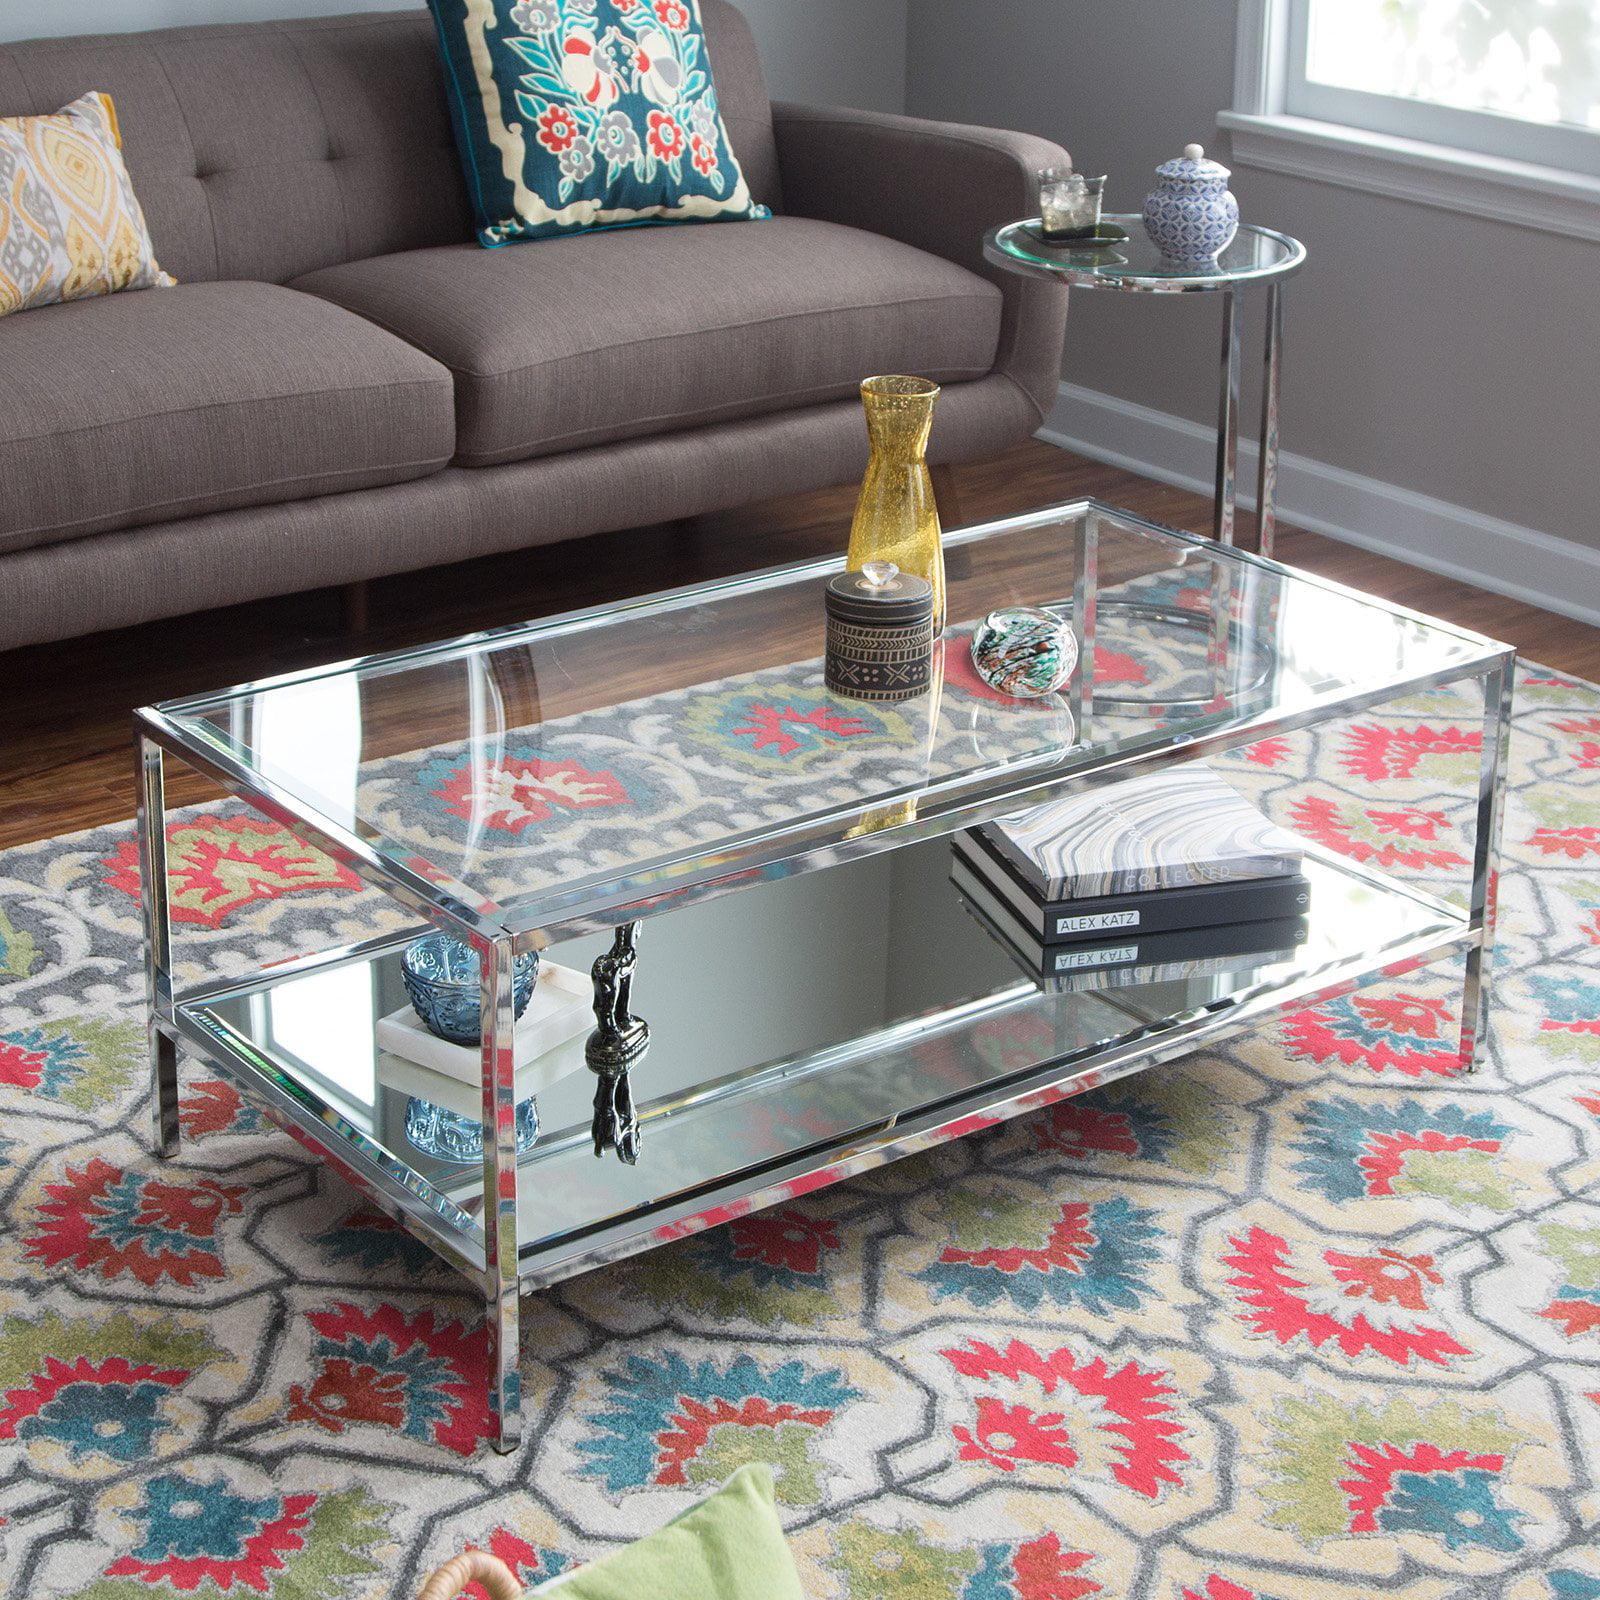 Belham Living Lamont Coffee Table - Chrome